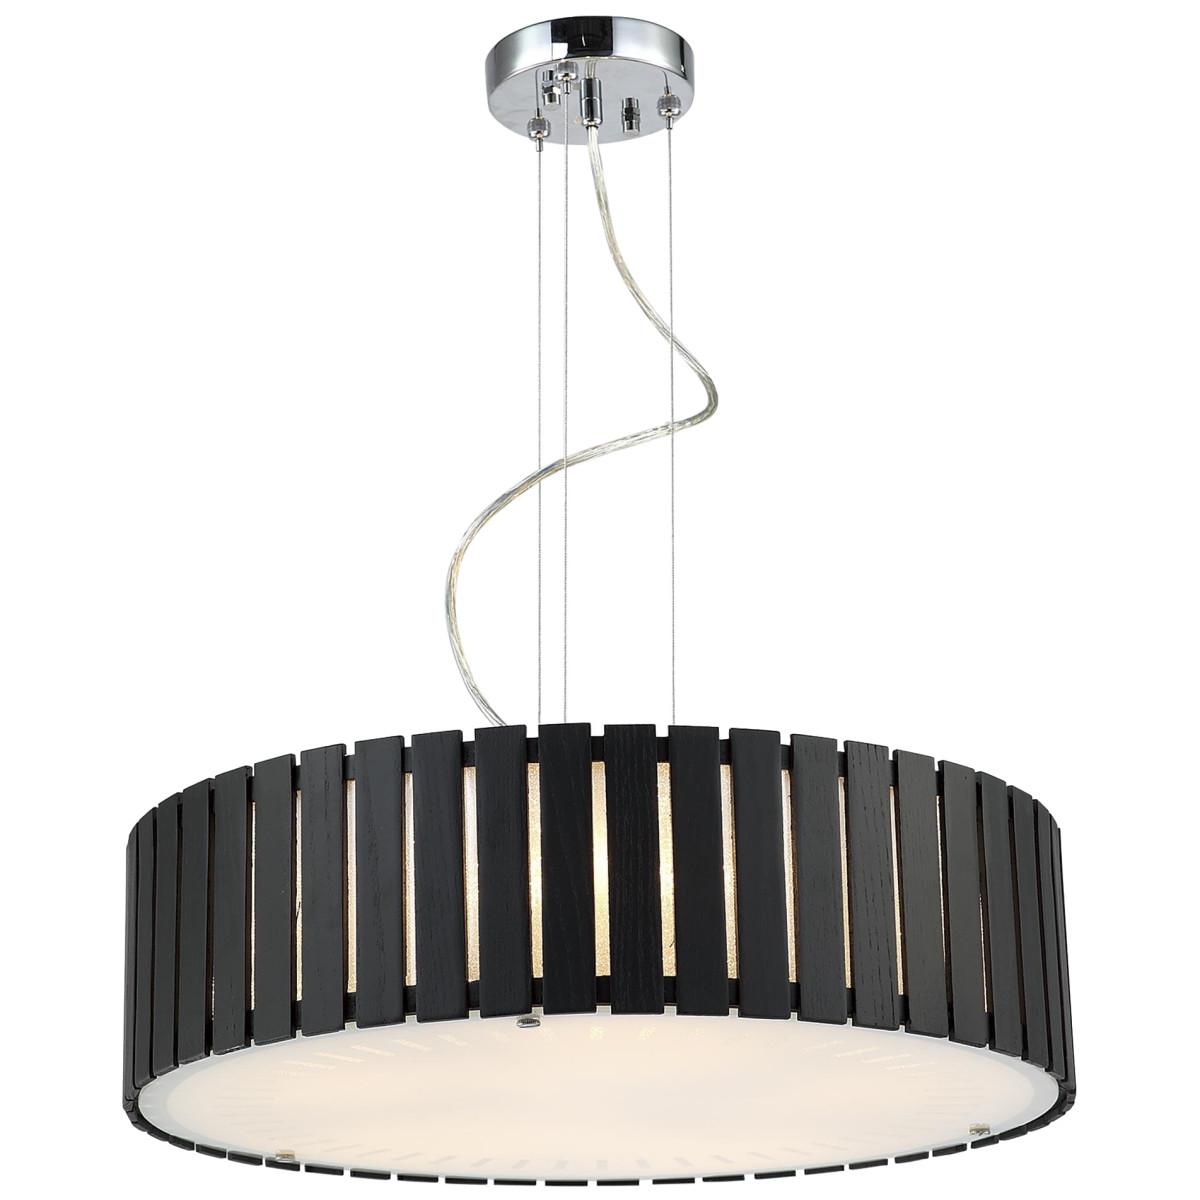 Люстра Citilux Ямато Cl137251 E27 5 Ламп 18 М²